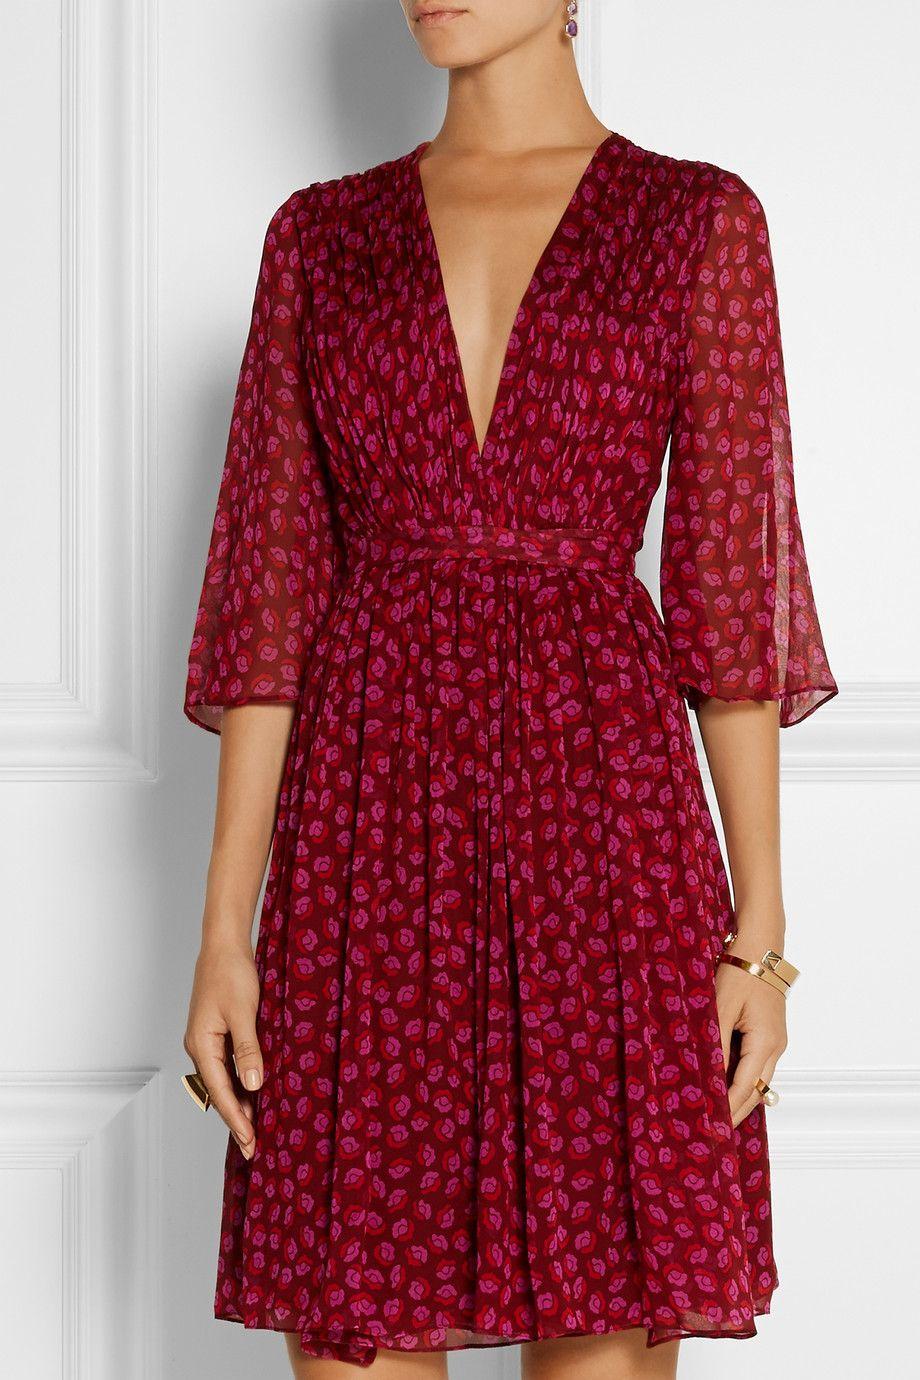 diane von furstenberg robe portefeuille en georgette de soie imprim e net a porter com. Black Bedroom Furniture Sets. Home Design Ideas